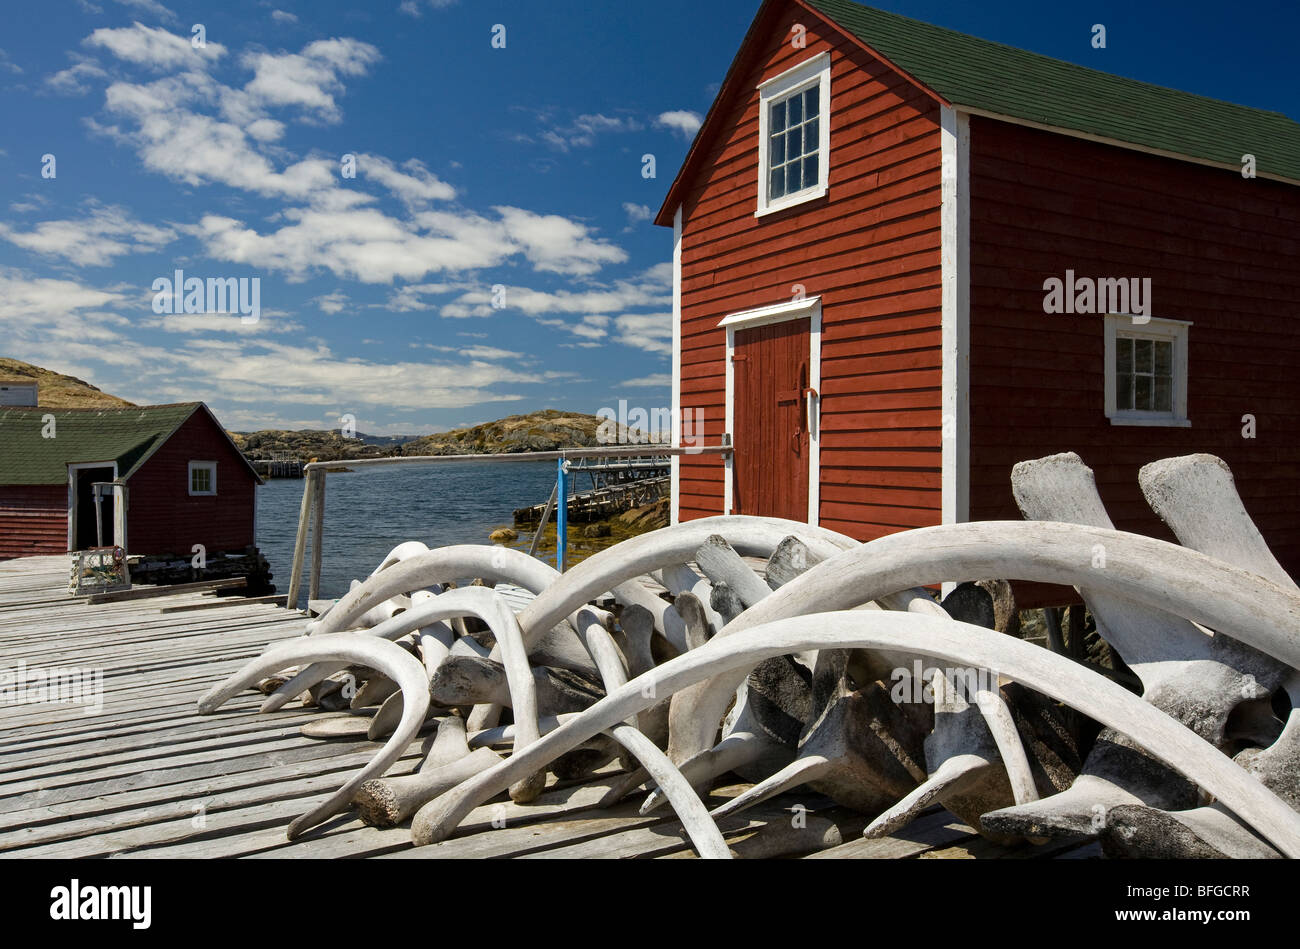 whale bones stacked on stage, Change Islands, Newfoundland & Labrador, Canada - Stock Image